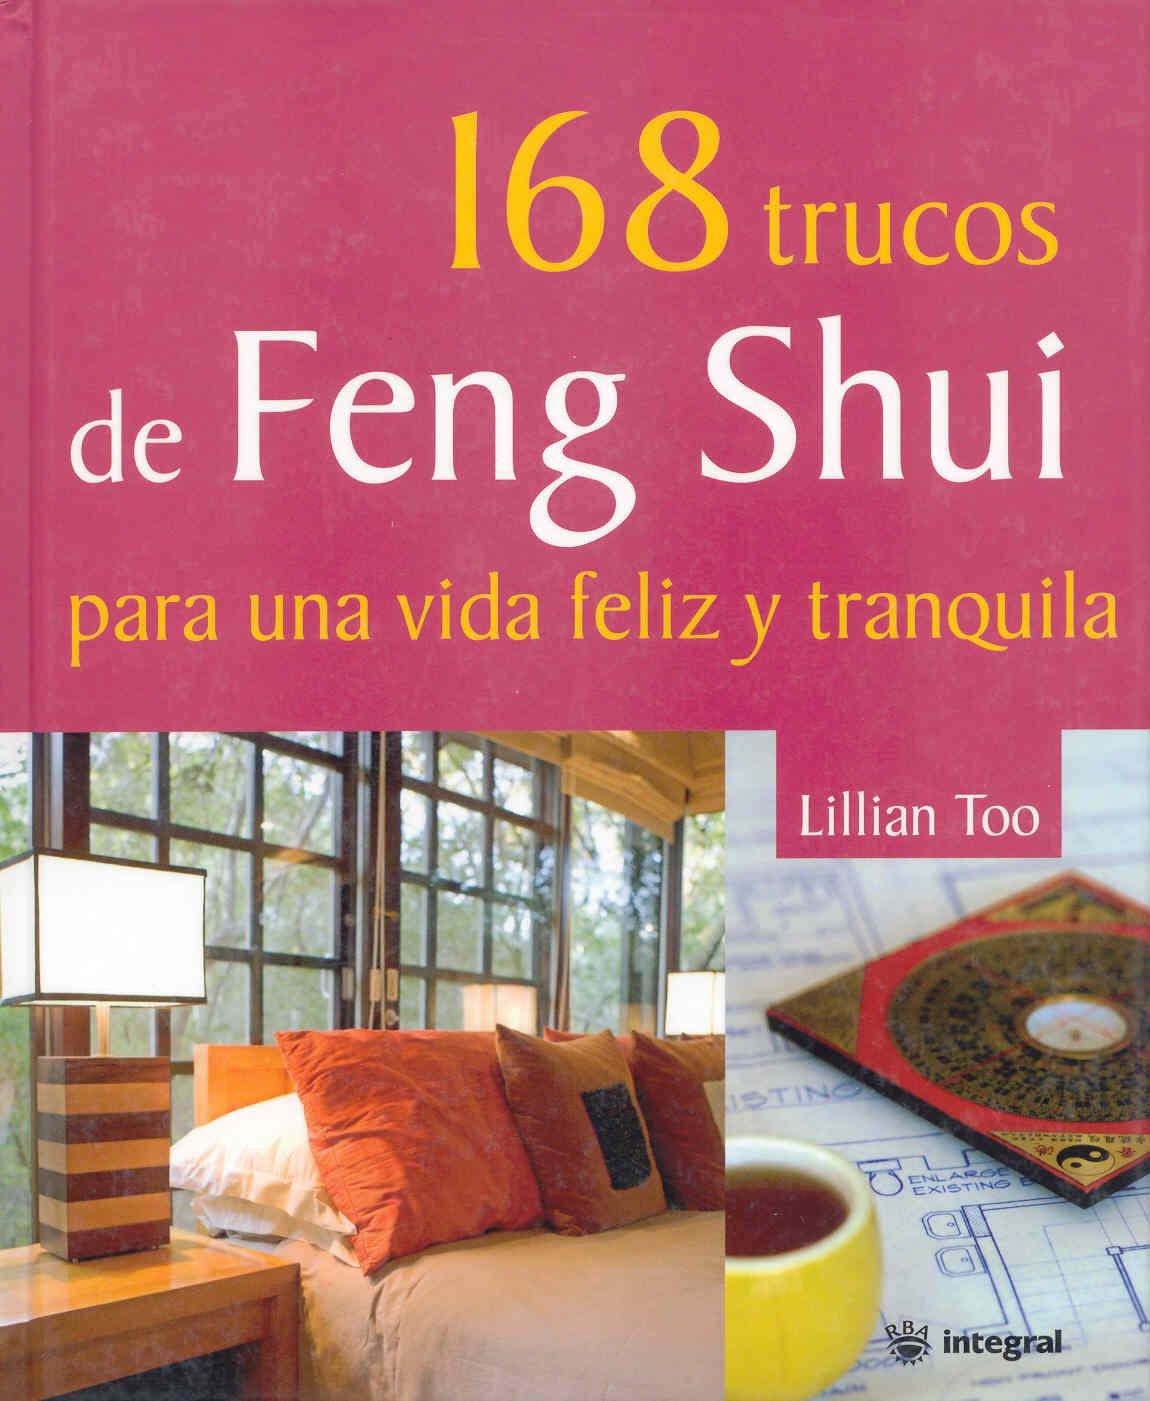 168 trucos de Feng Shui para una vida feliz y tranquila /Lillian Too's 168 Feng Shui Ways to a Calm & Happy Life (Spanish Edition)